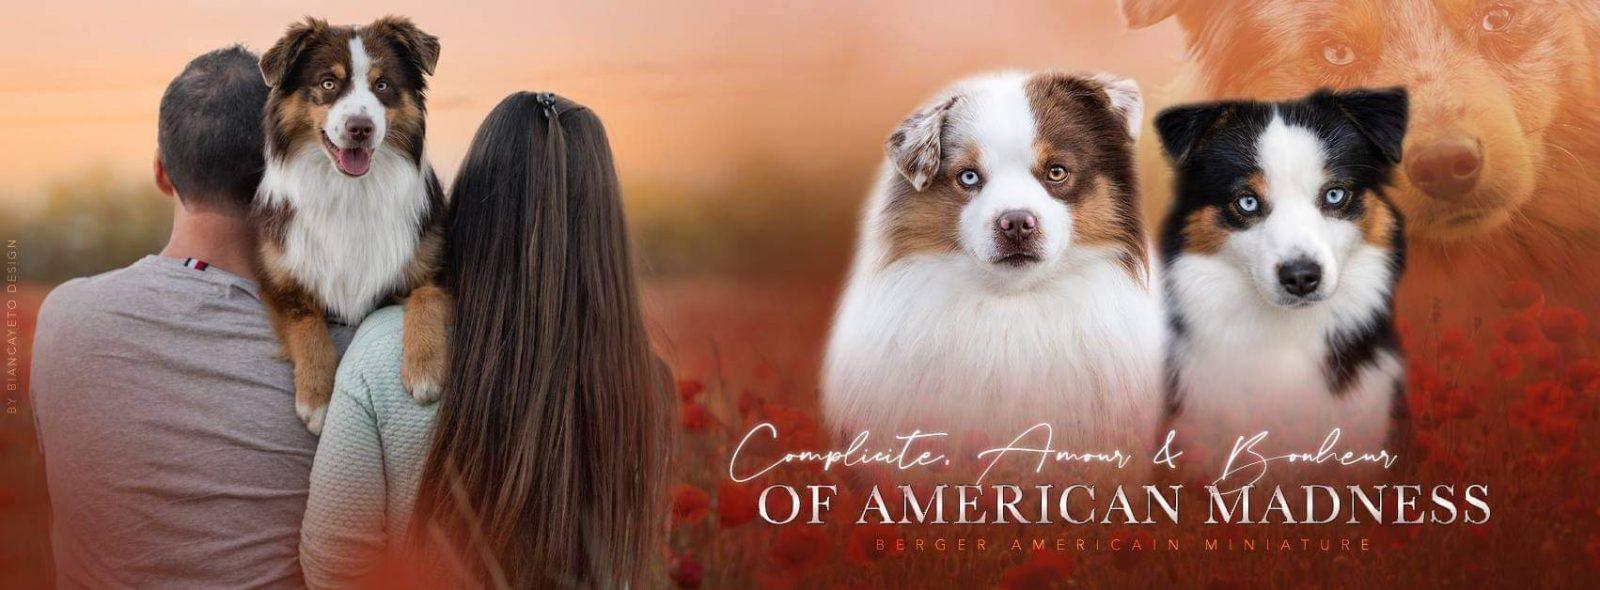 élevage berger américain miniature of american madness